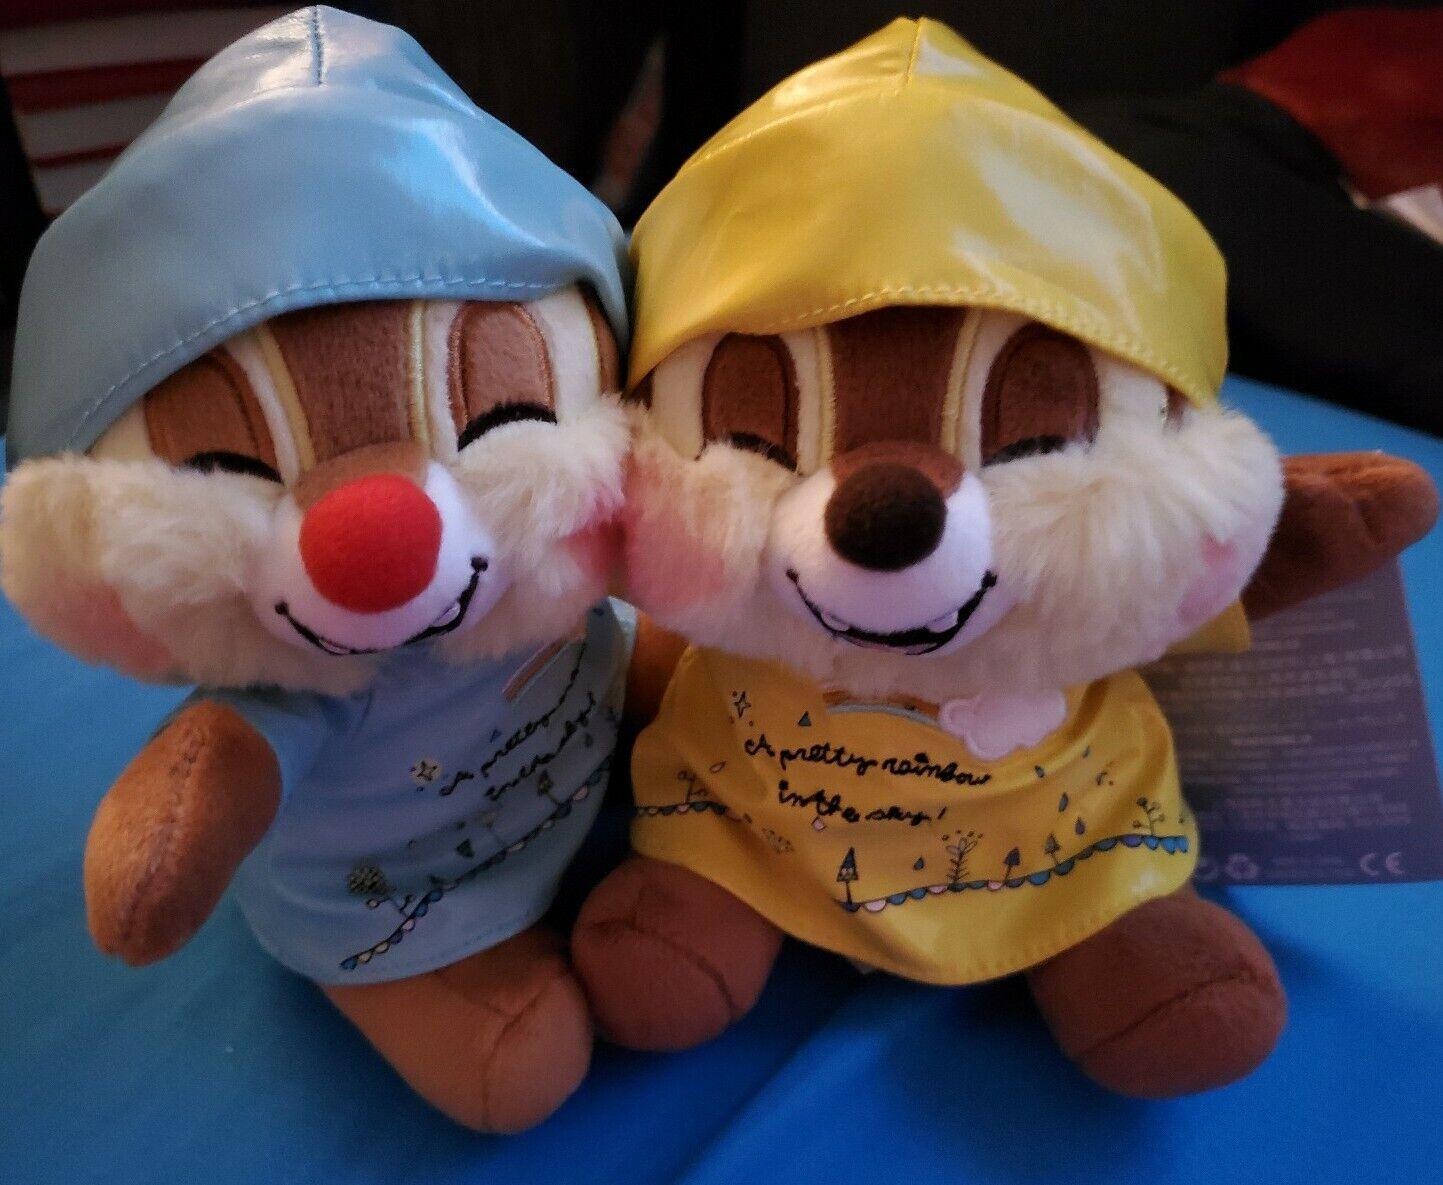 Disney Japan Baymax And Mochi Plush Doll Big Hero 6 Happy Rainy Day 600889 For Sale Online Ebay